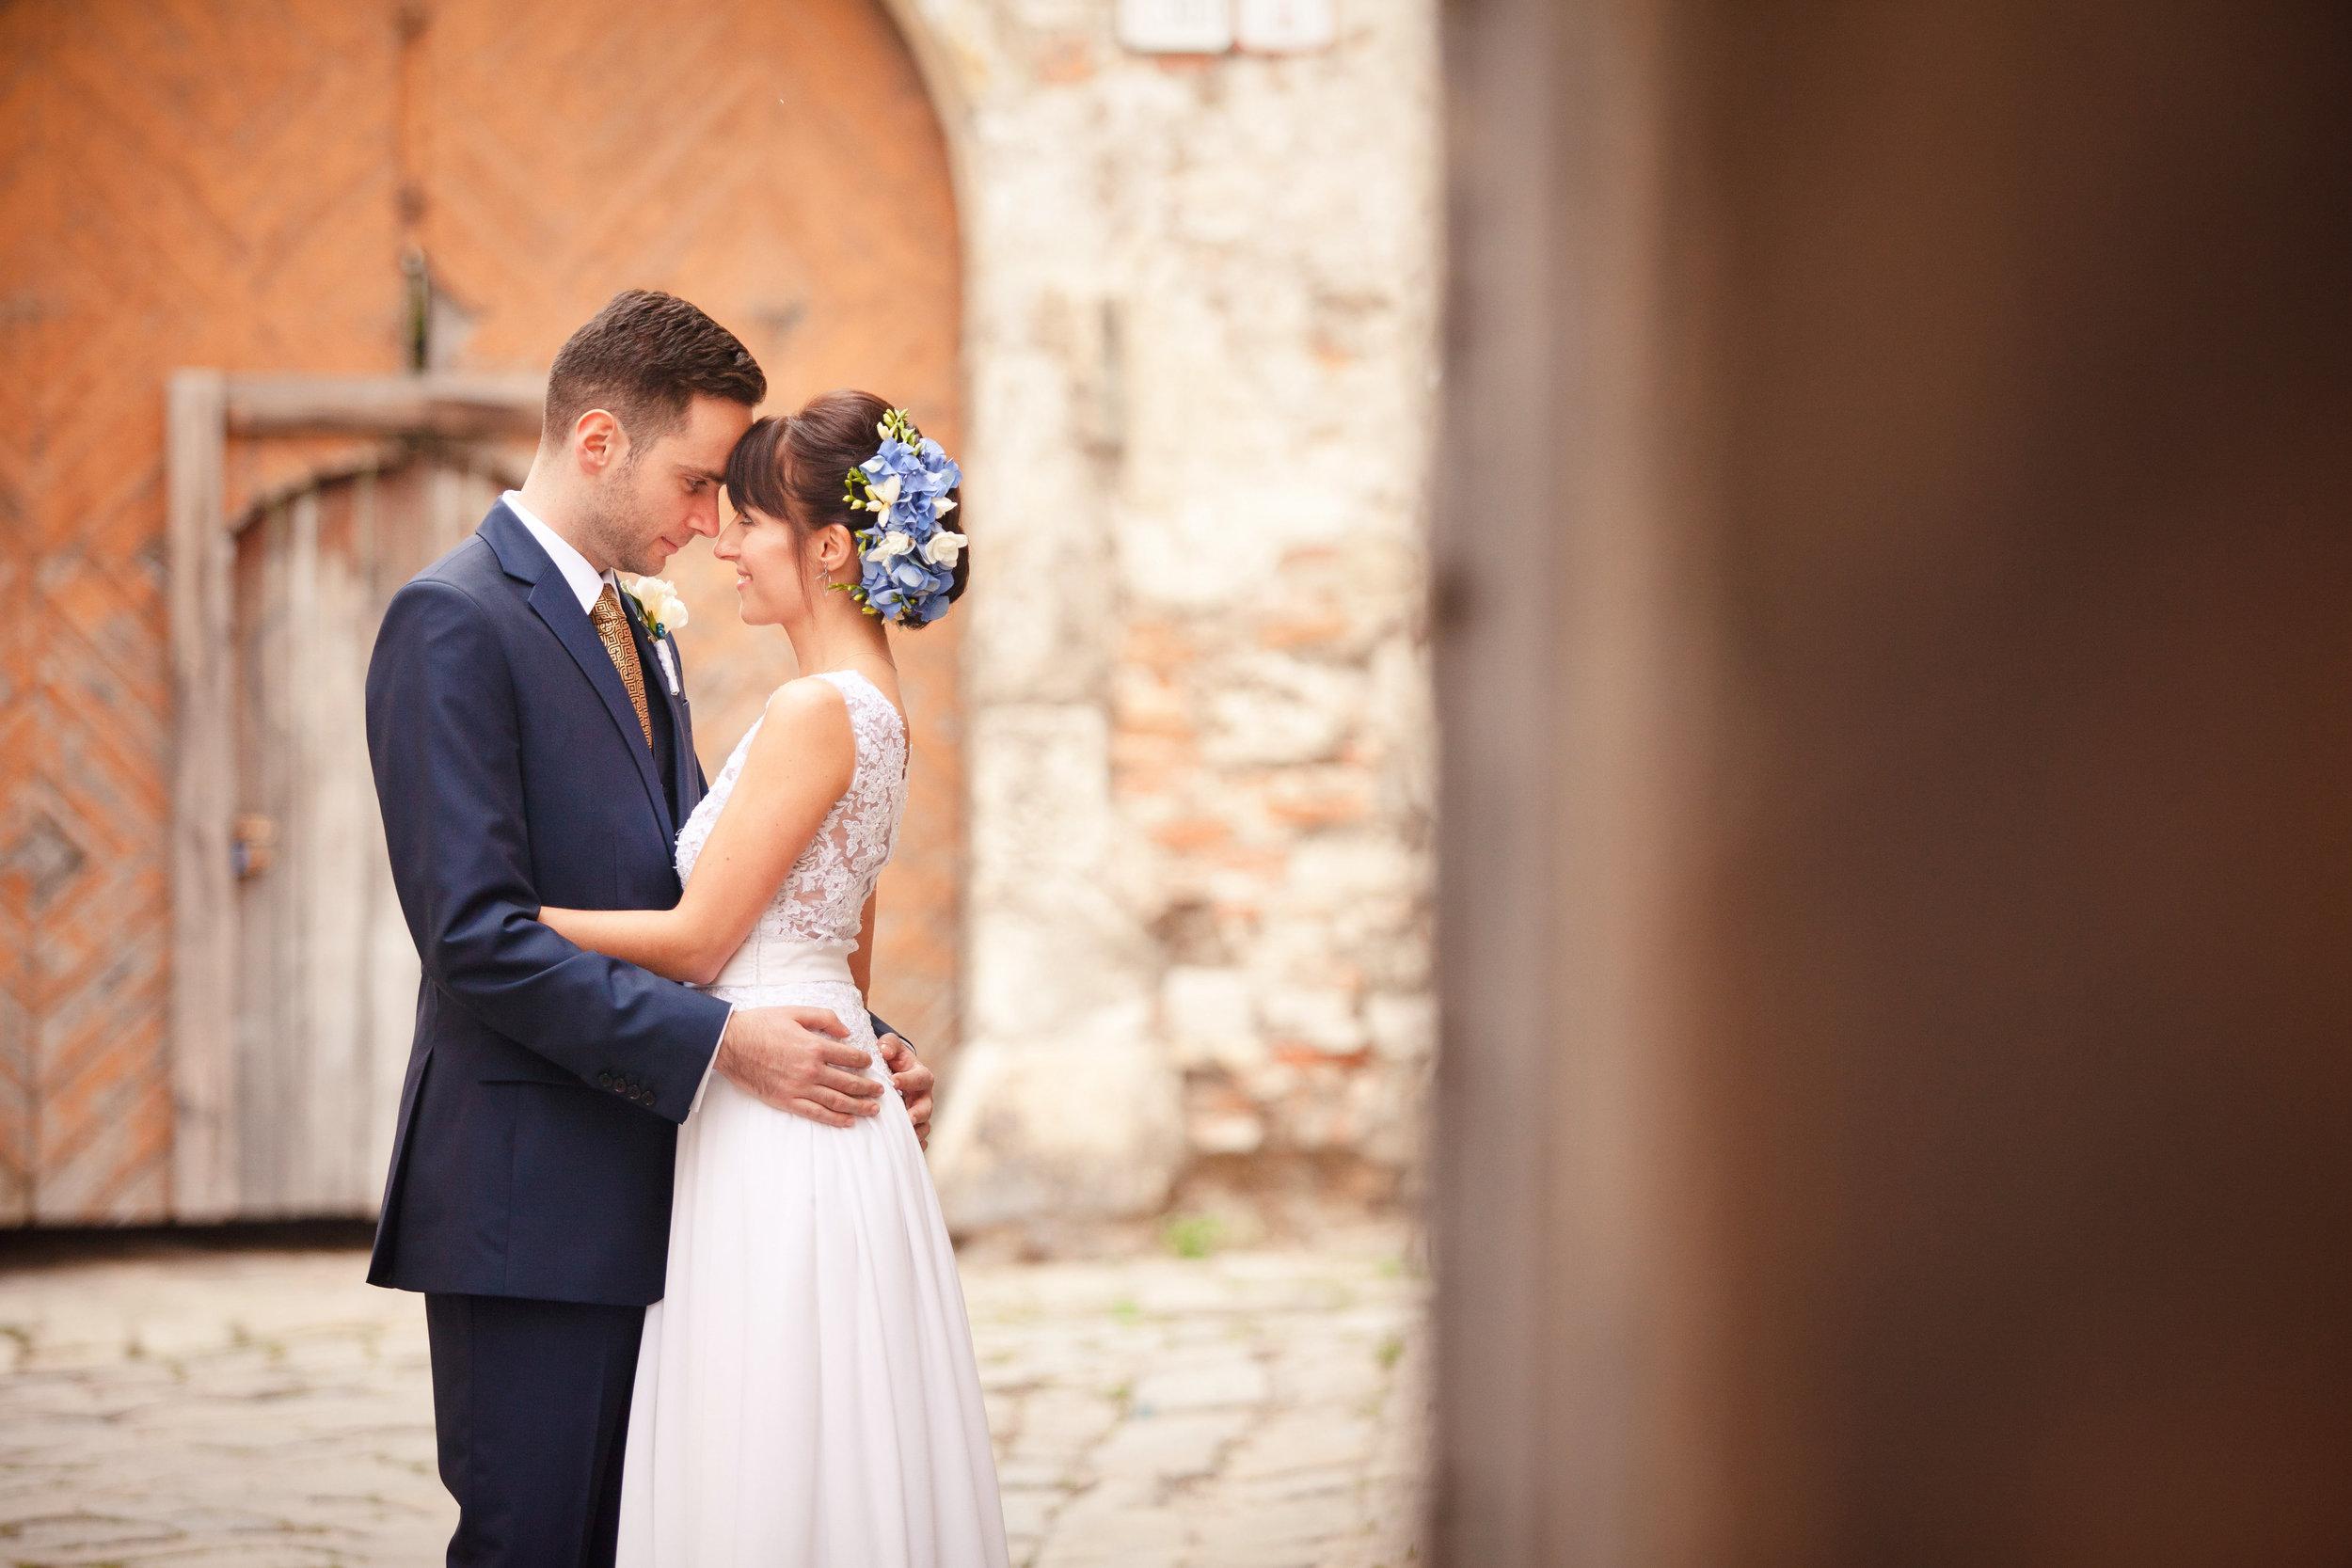 destination-wedding-photographer-bratislava-slovakia-europe-portrait-session-5.jpg